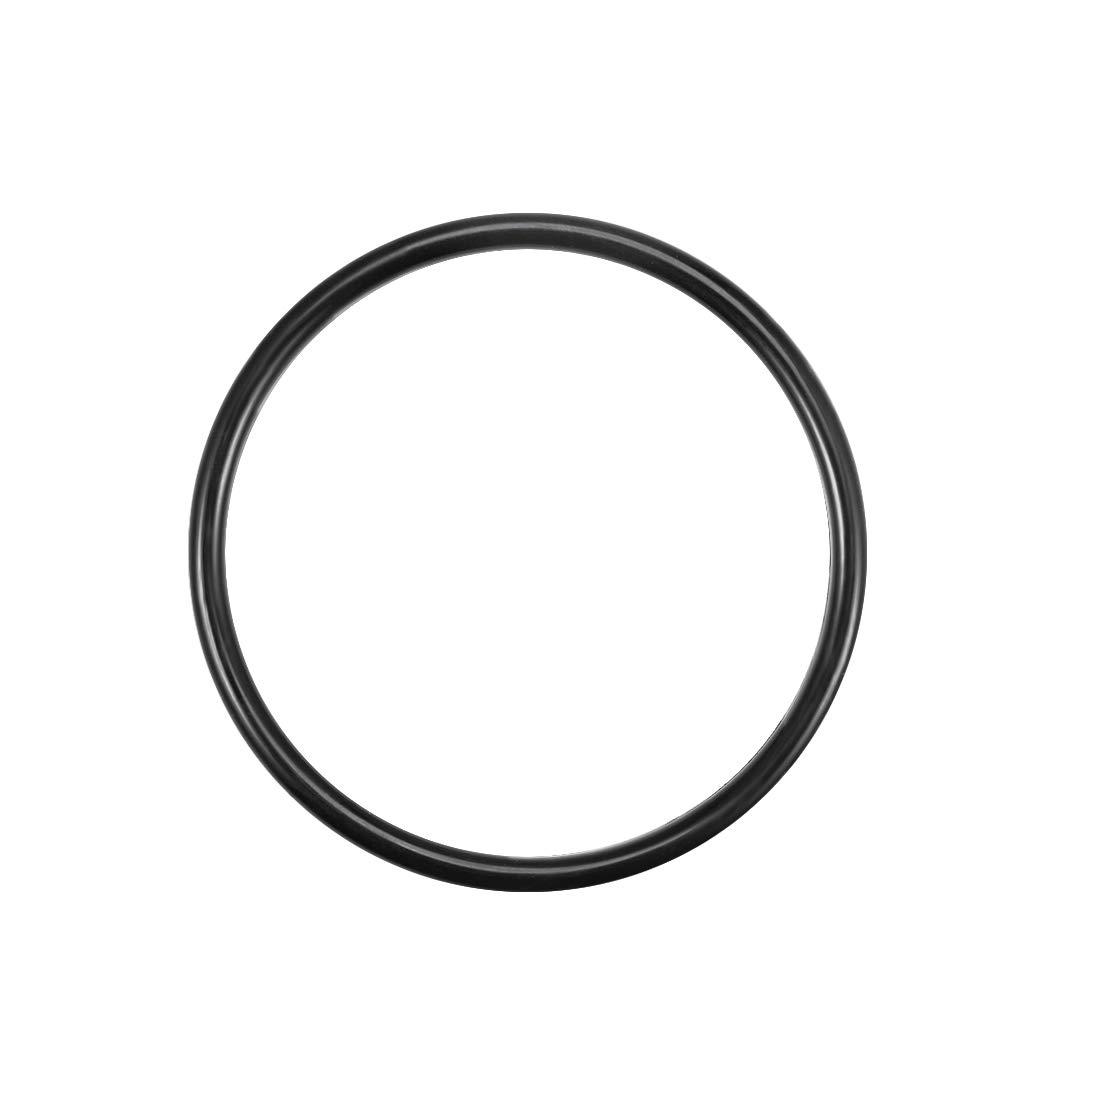 Sourcingmap junta t/órica de goma de nitrilo 21 mm-393,8 mm de di/ámetro interior 5 unidades